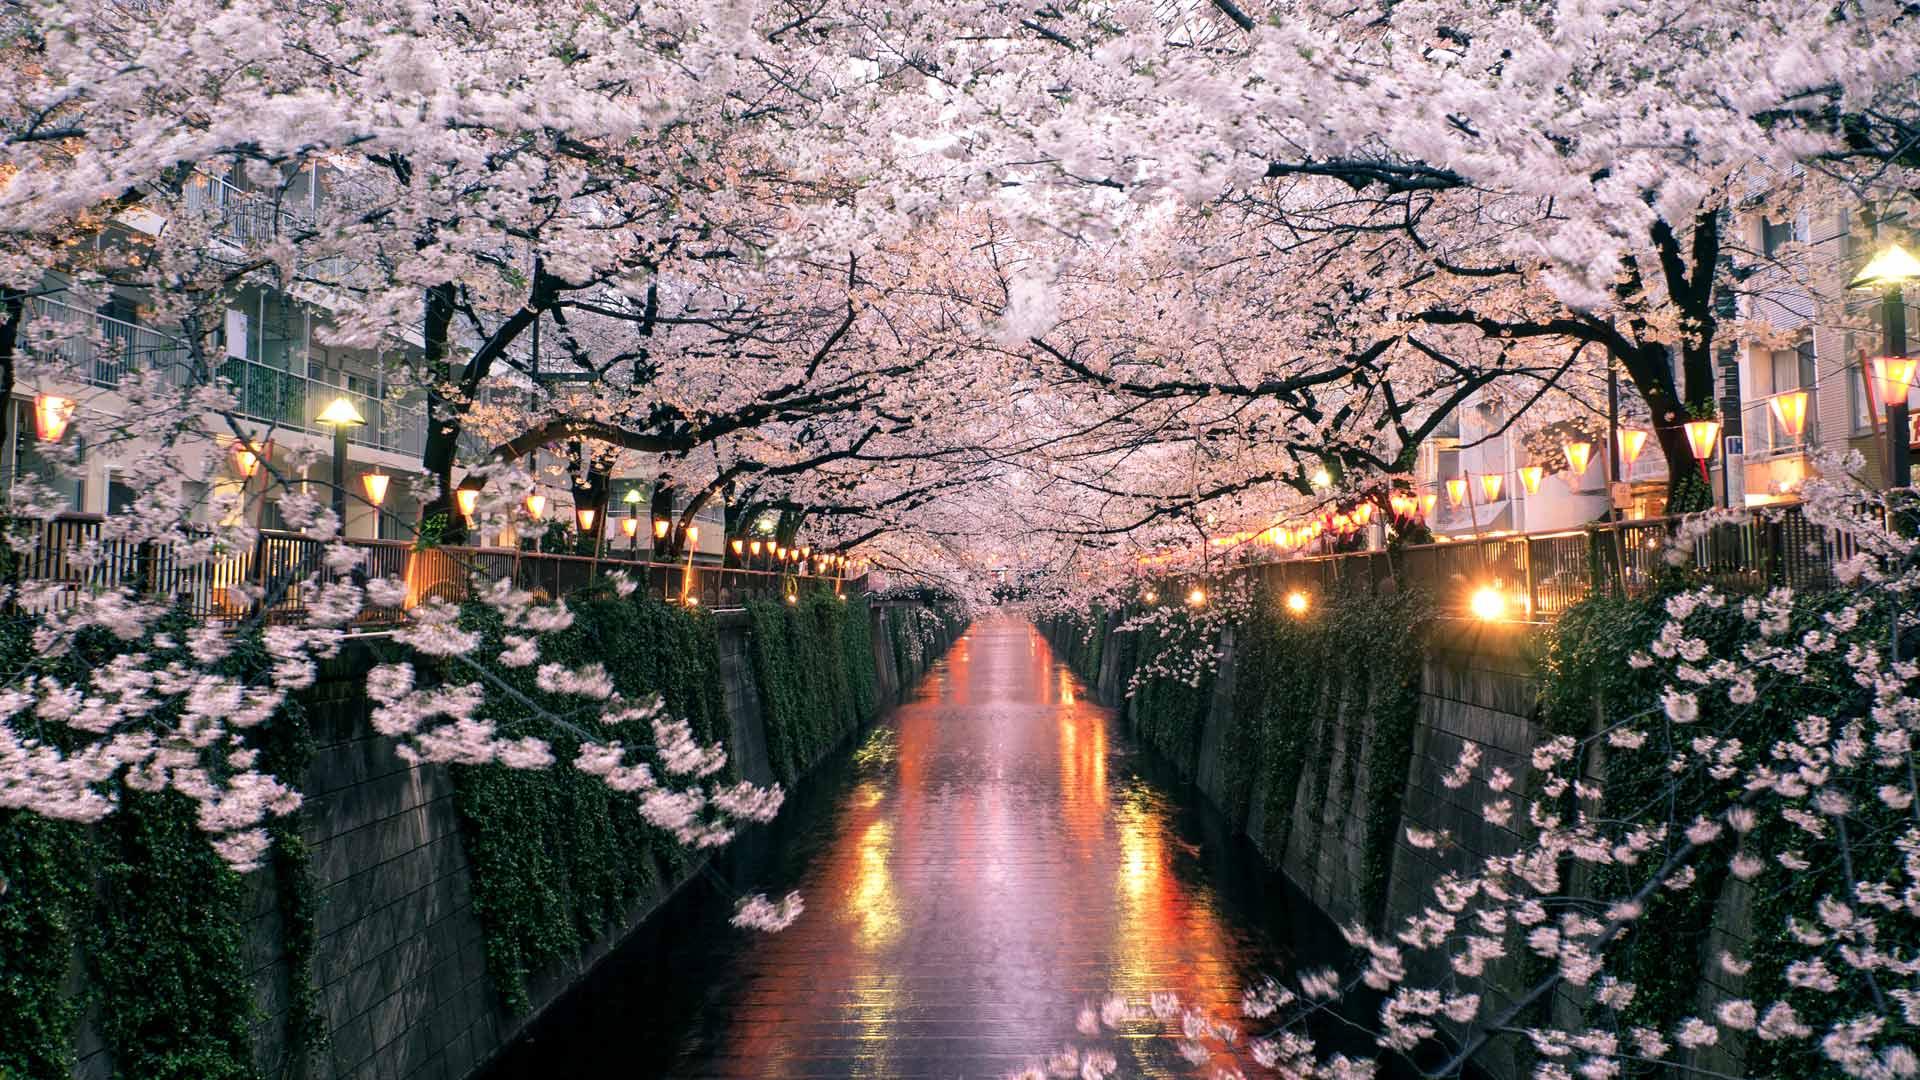 Sakura Fes